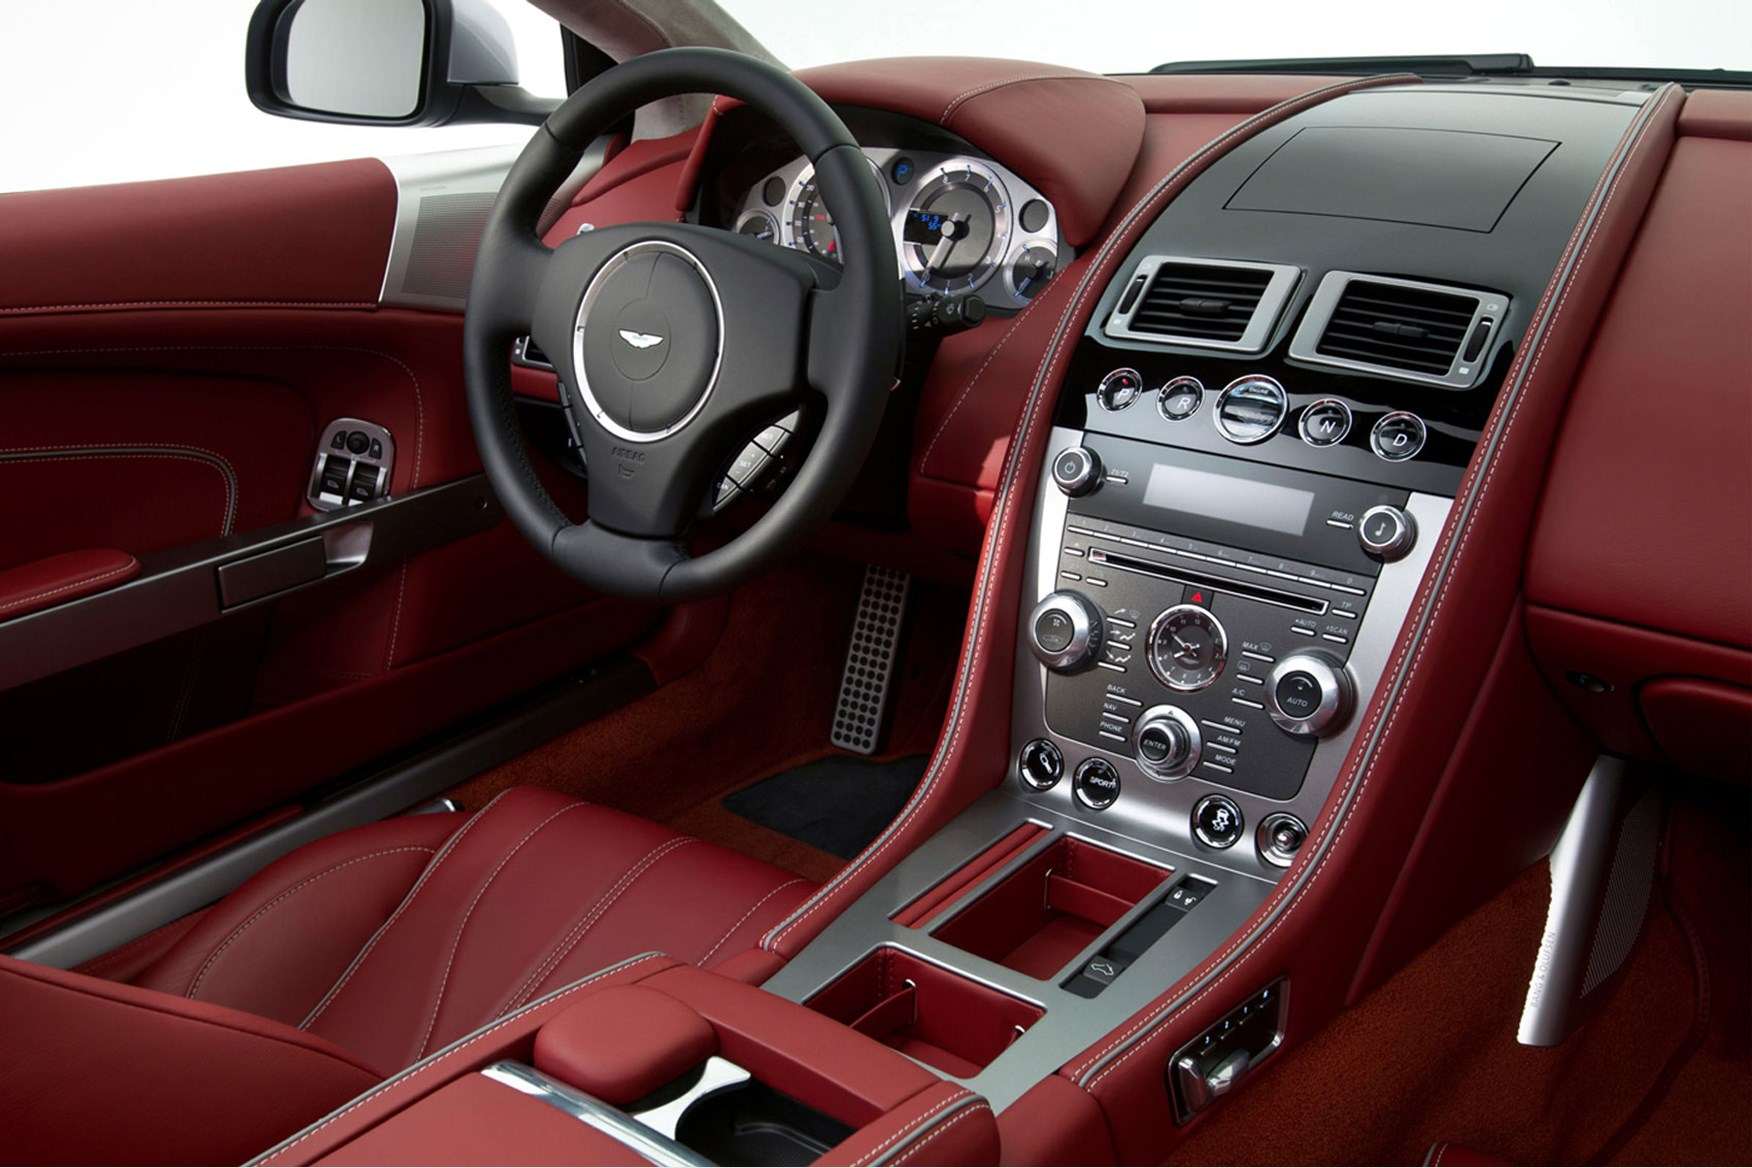 aston martin interior. aston martin db9 interior h